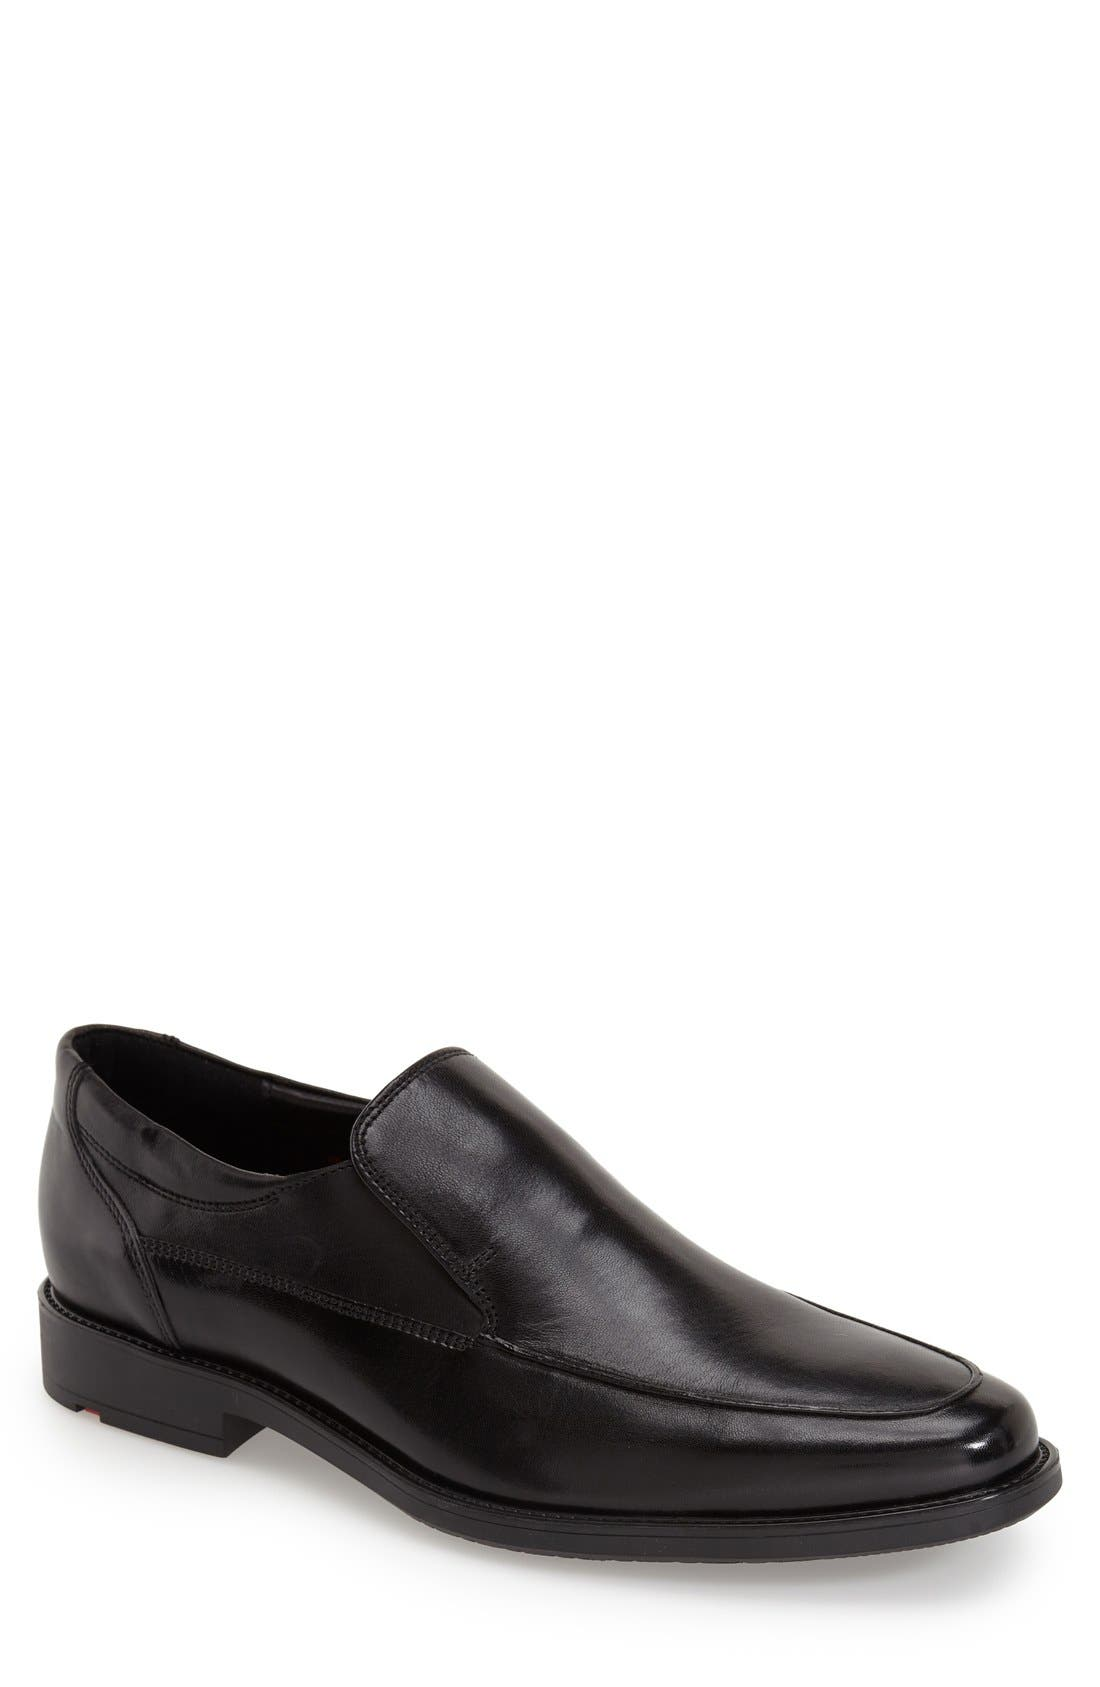 'Nante' Venetian Loafer,                         Main,                         color, Black